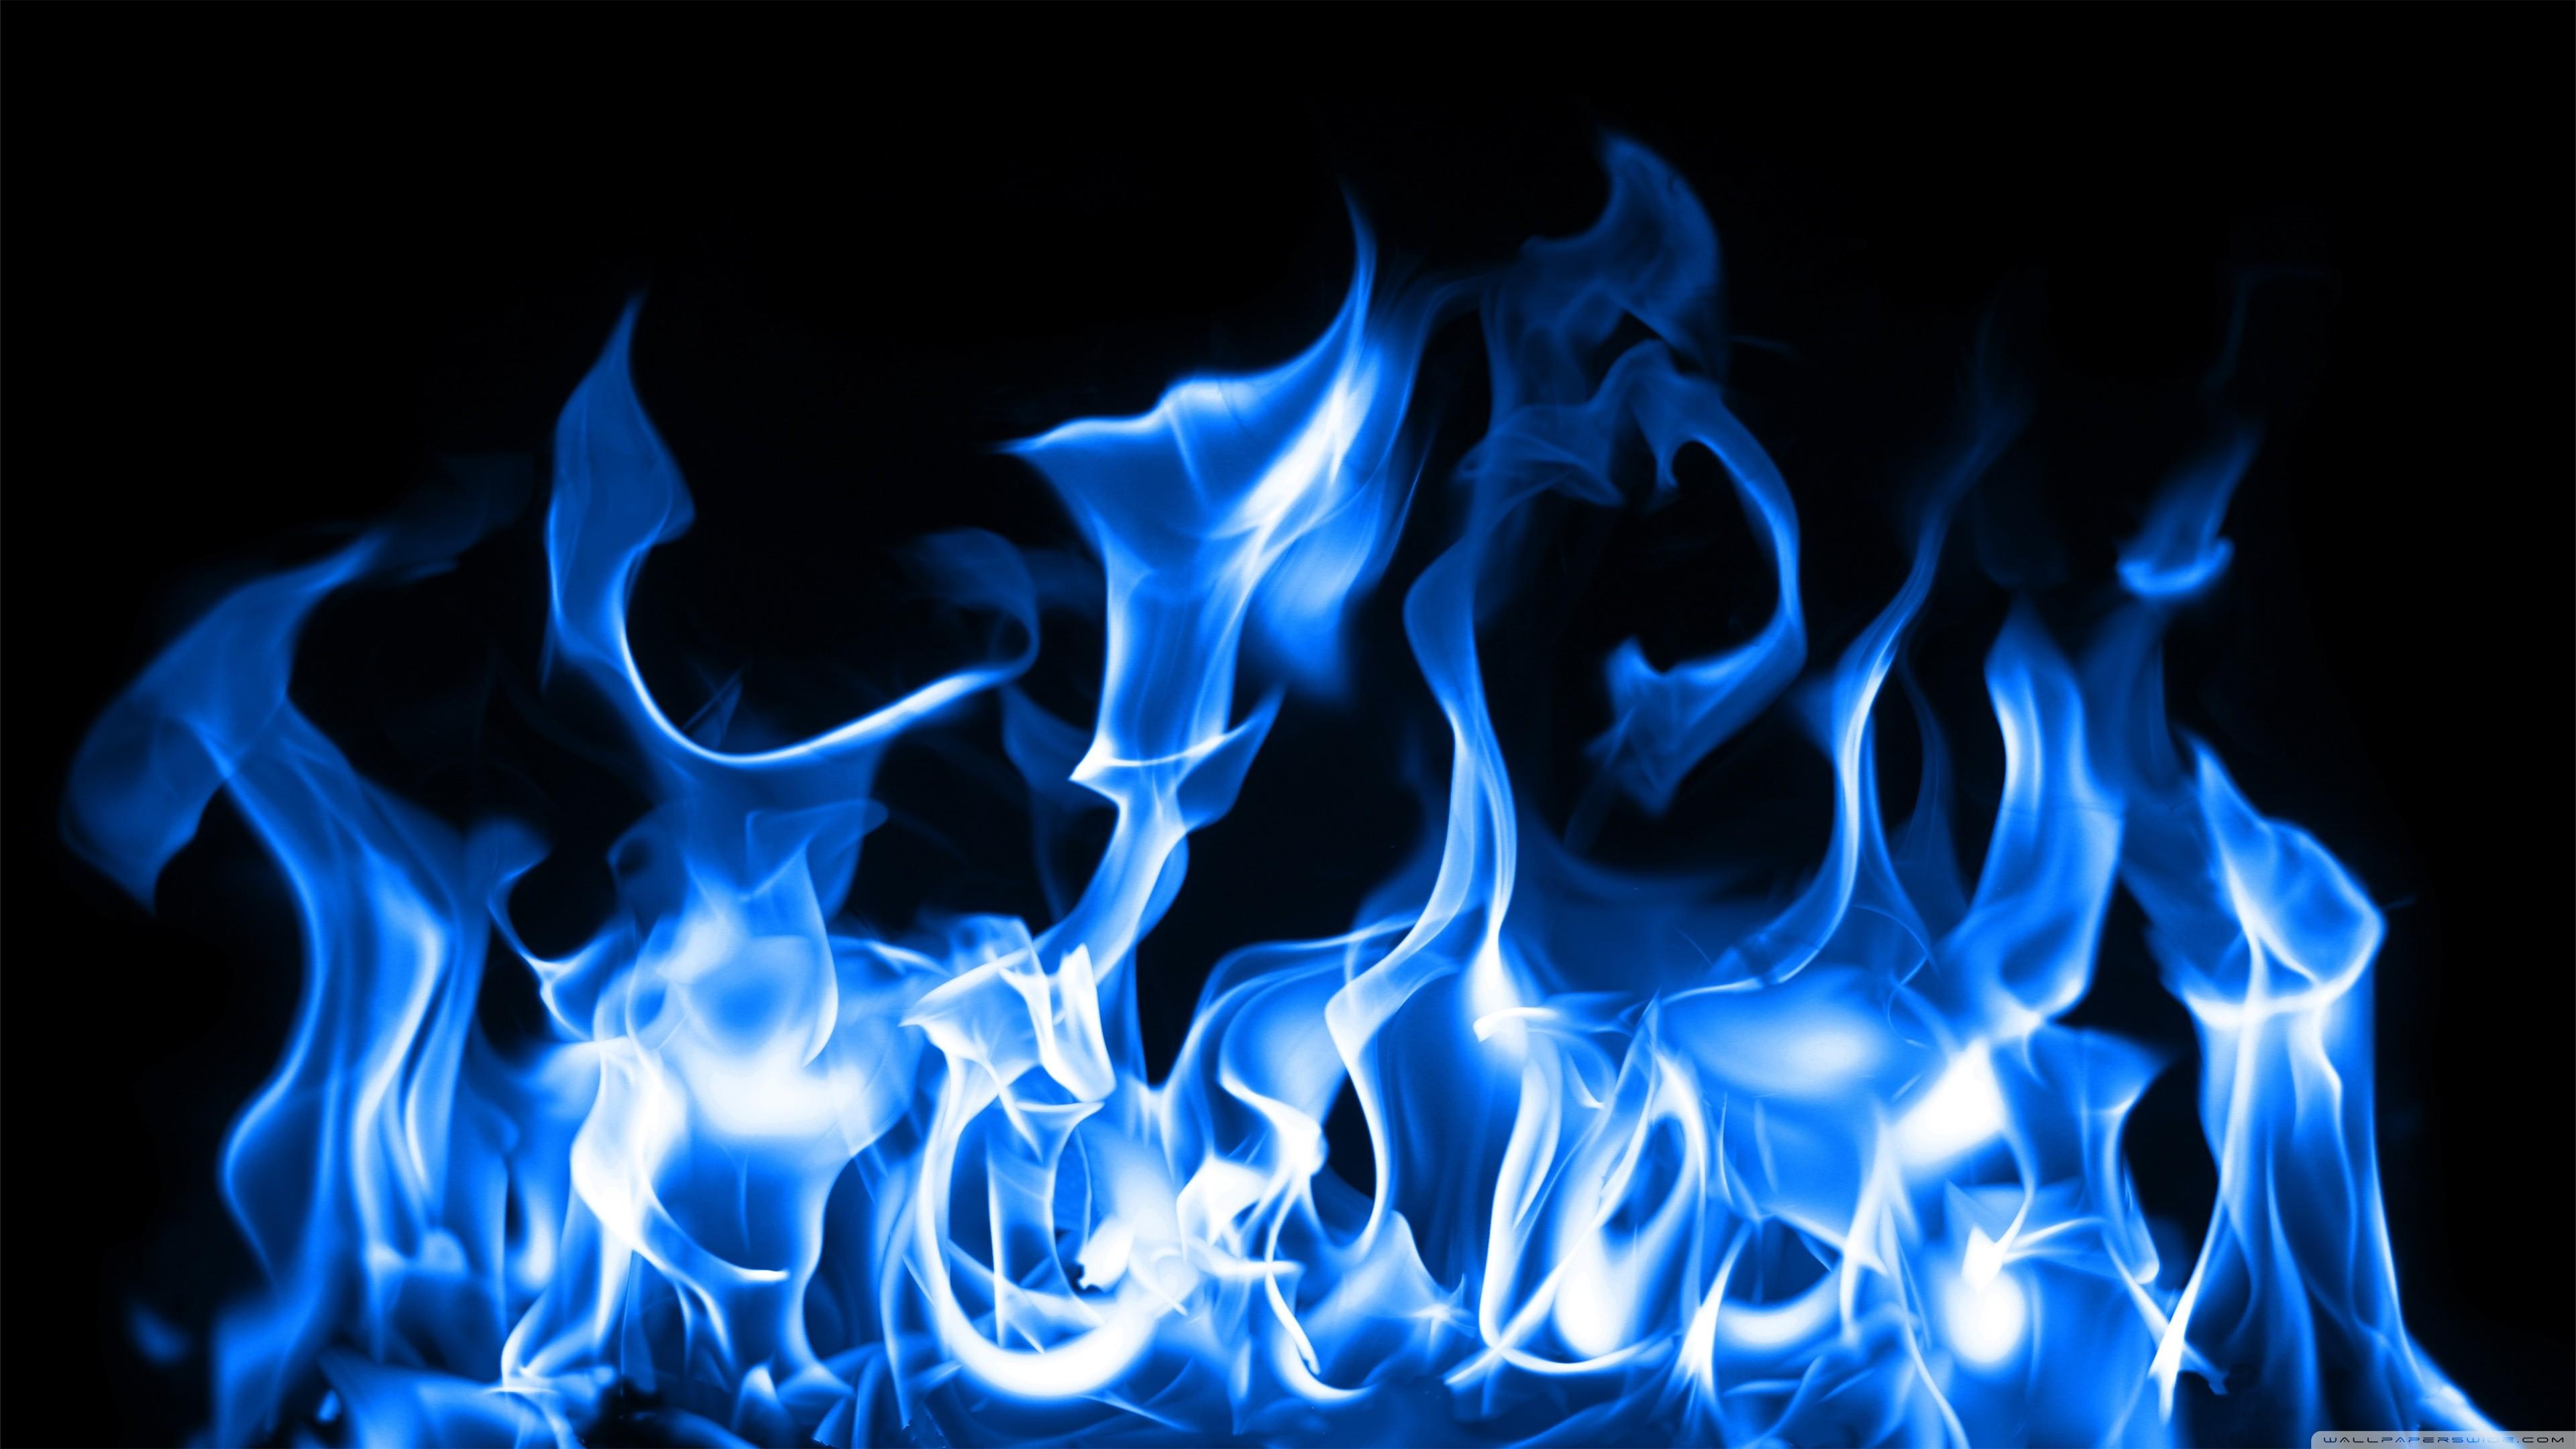 Blue 1080p Images (3840×2160, TIN771771)